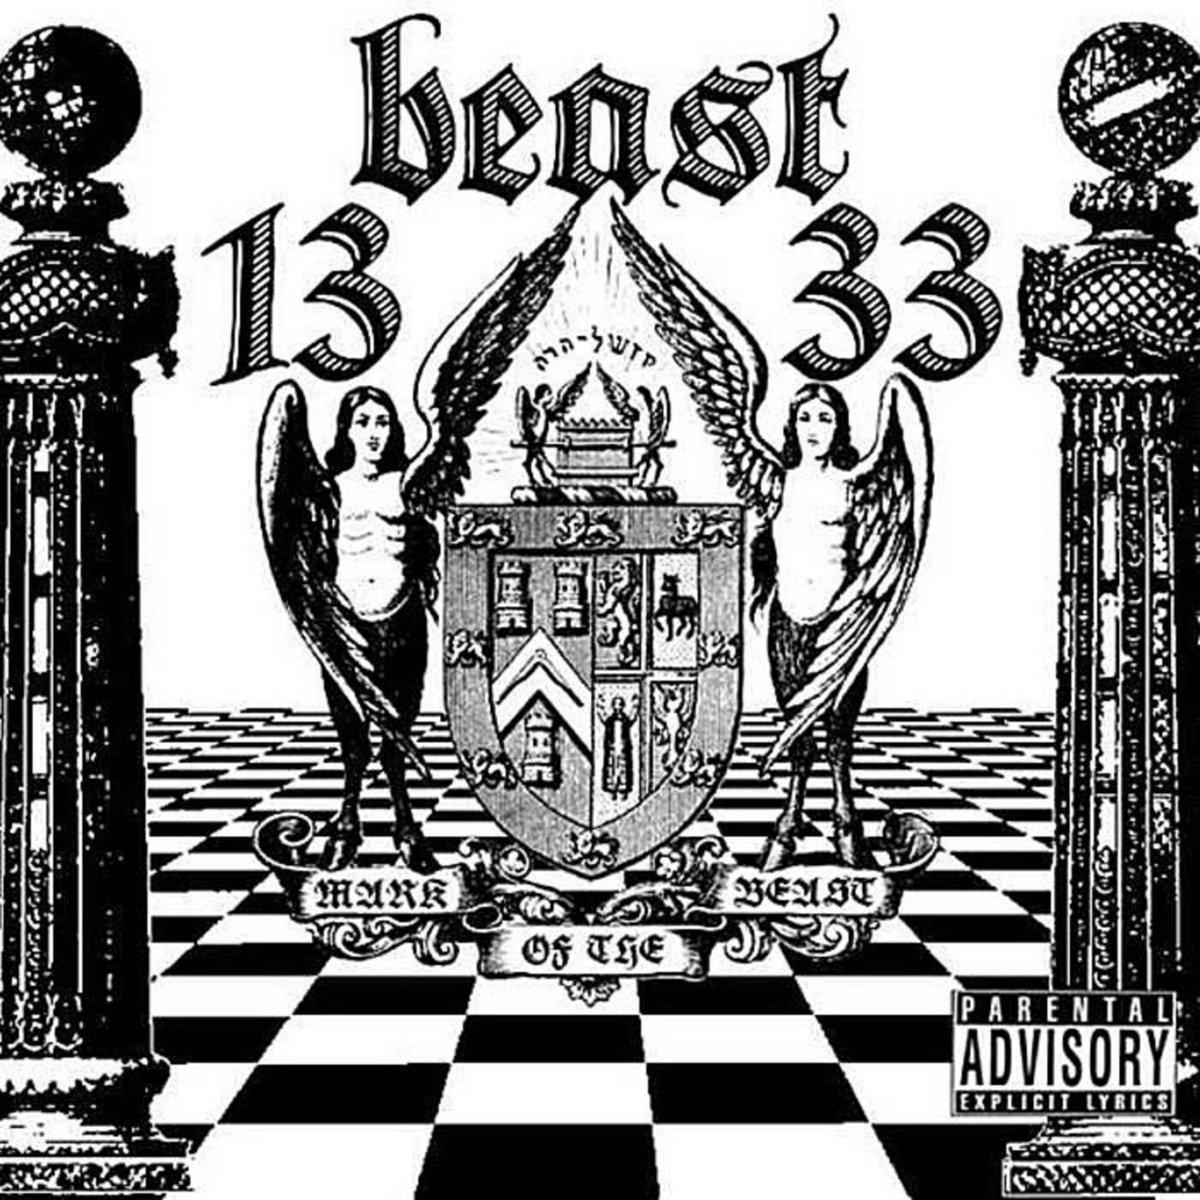 by Beast 1333